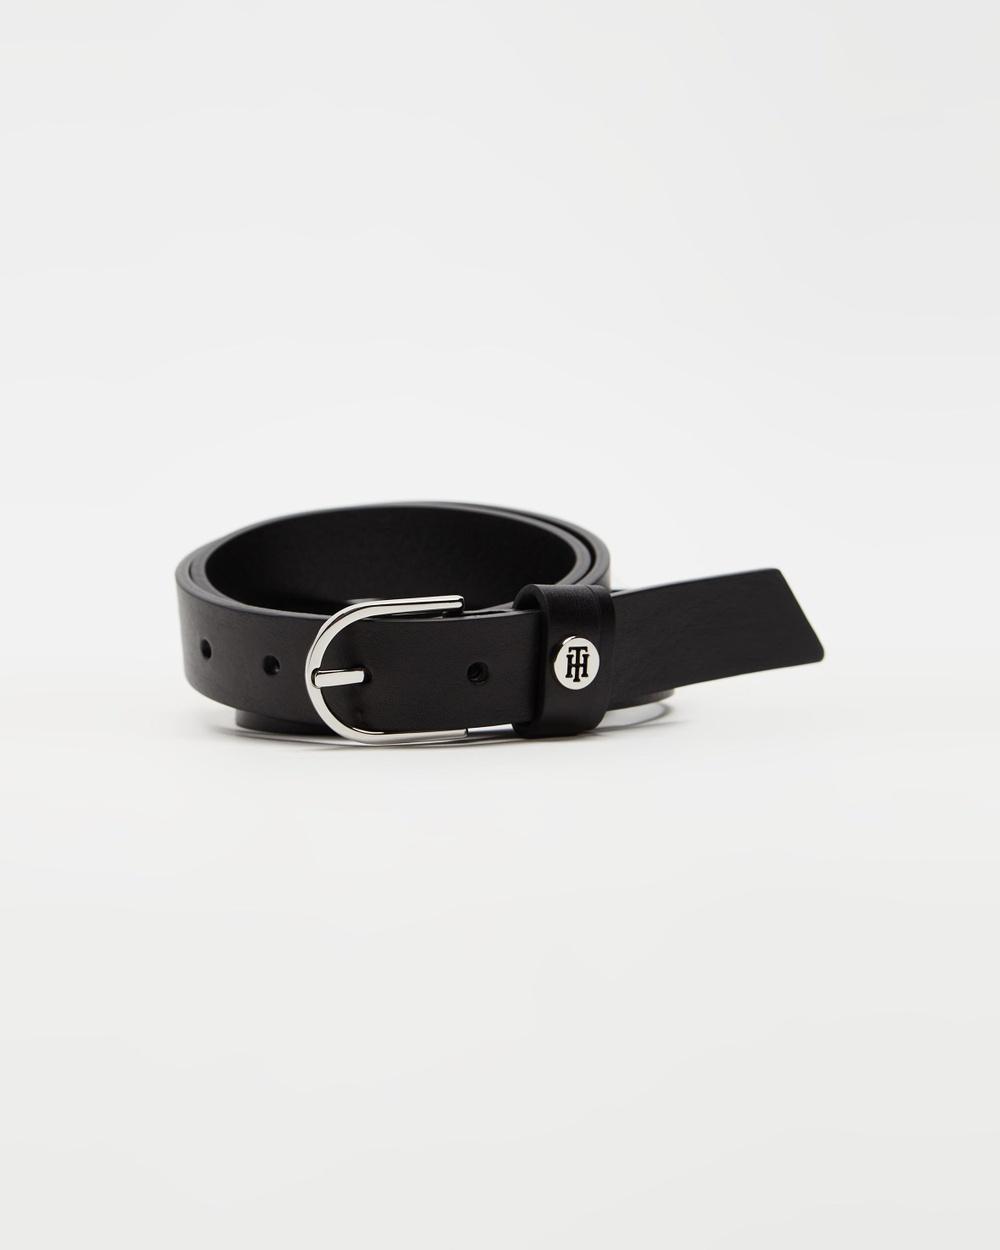 Tommy Hilfiger Classic Belt 2.5 Belts Black